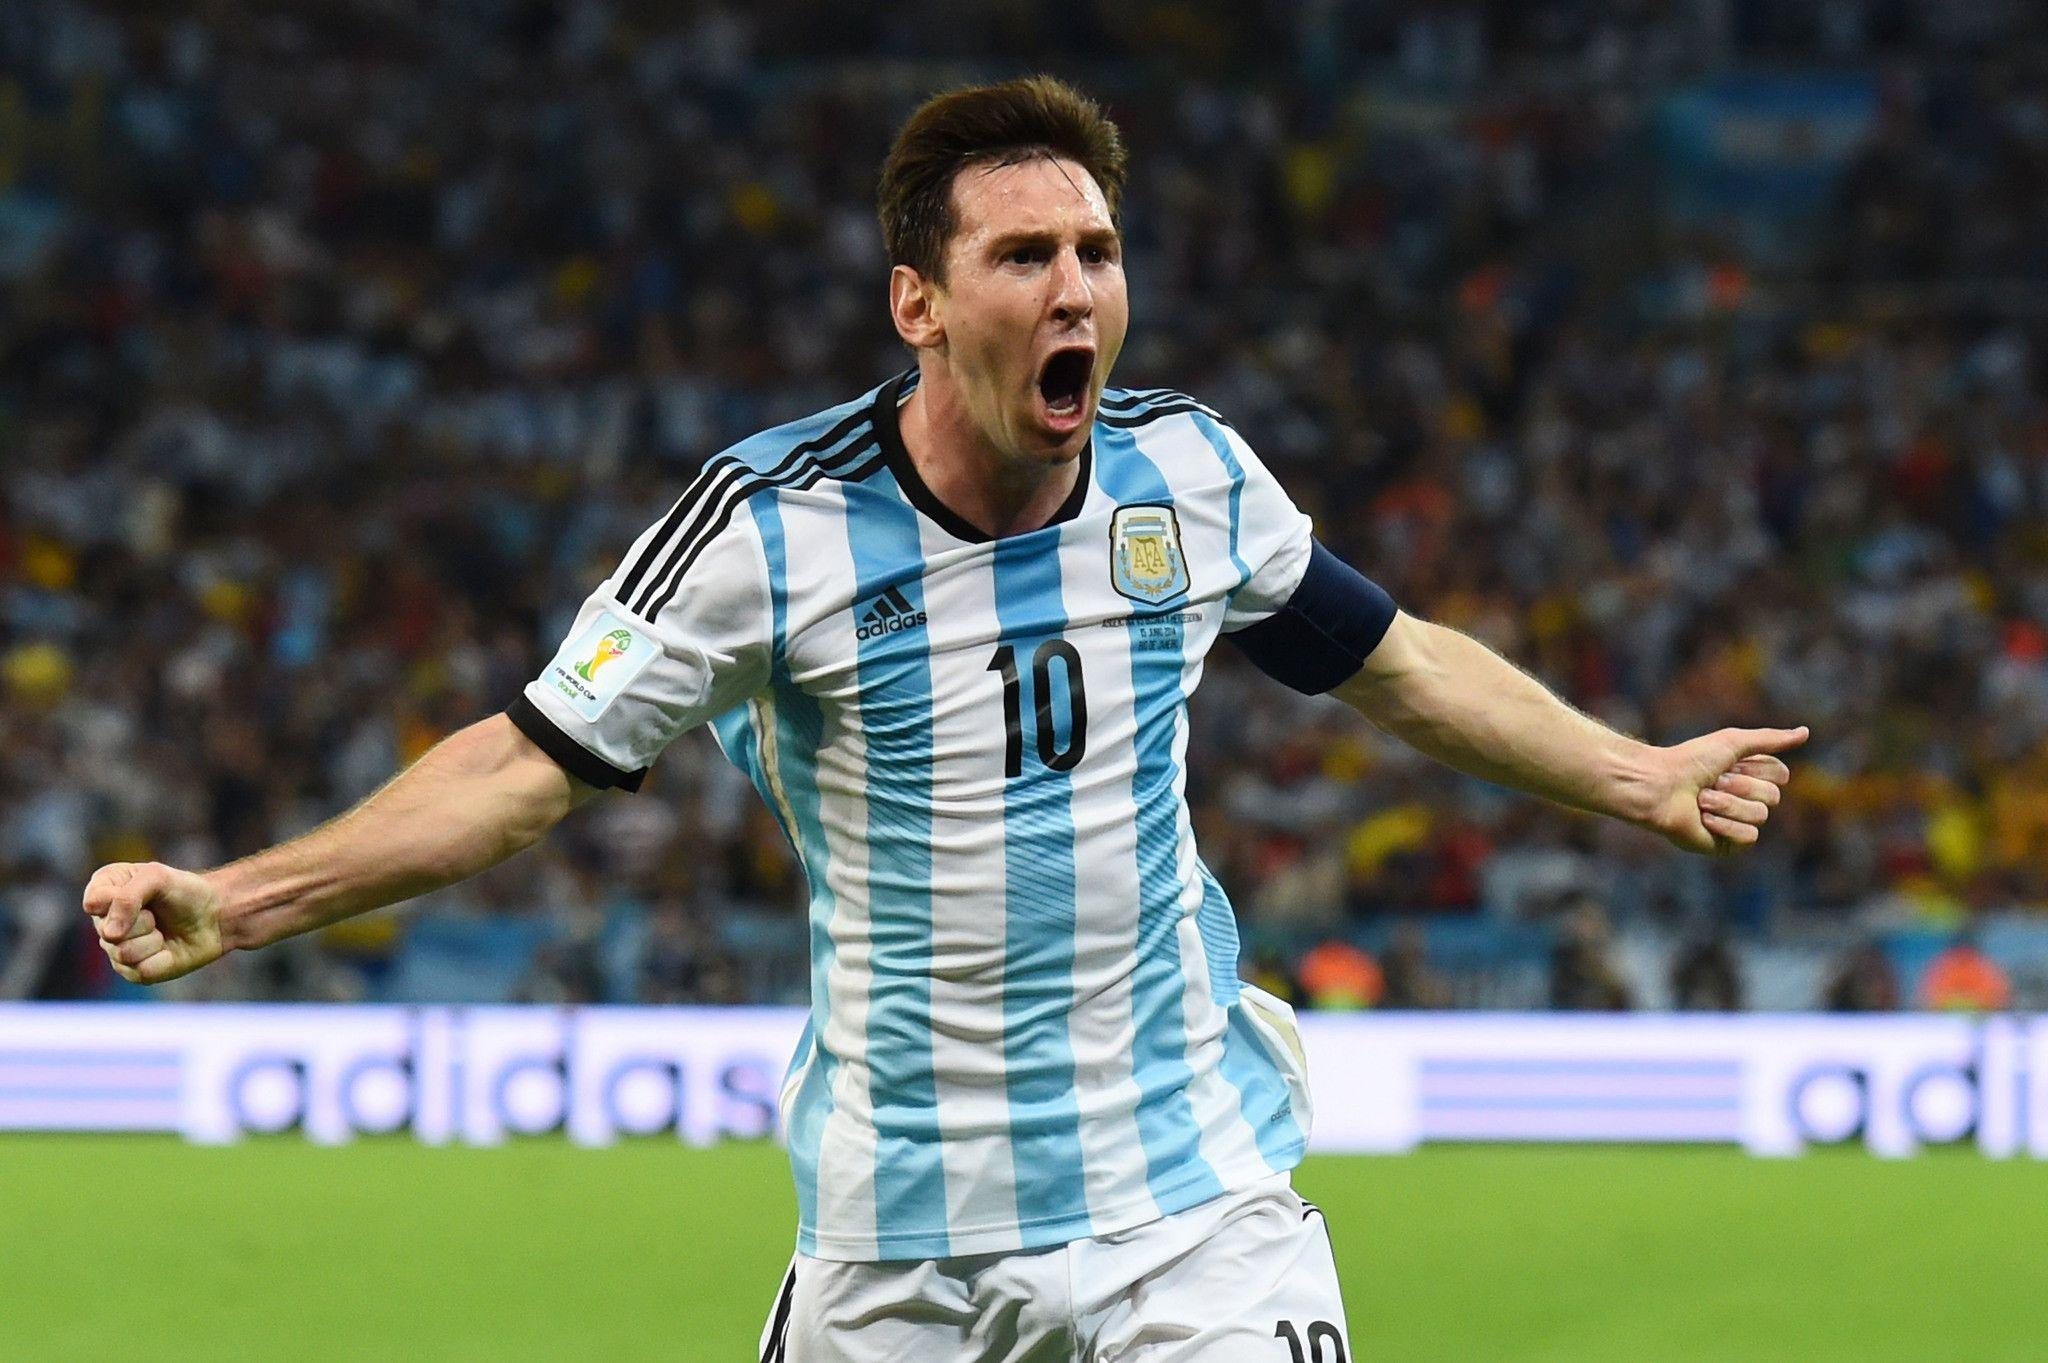 Messi Wallpapers 2015 Wallpaper Cave